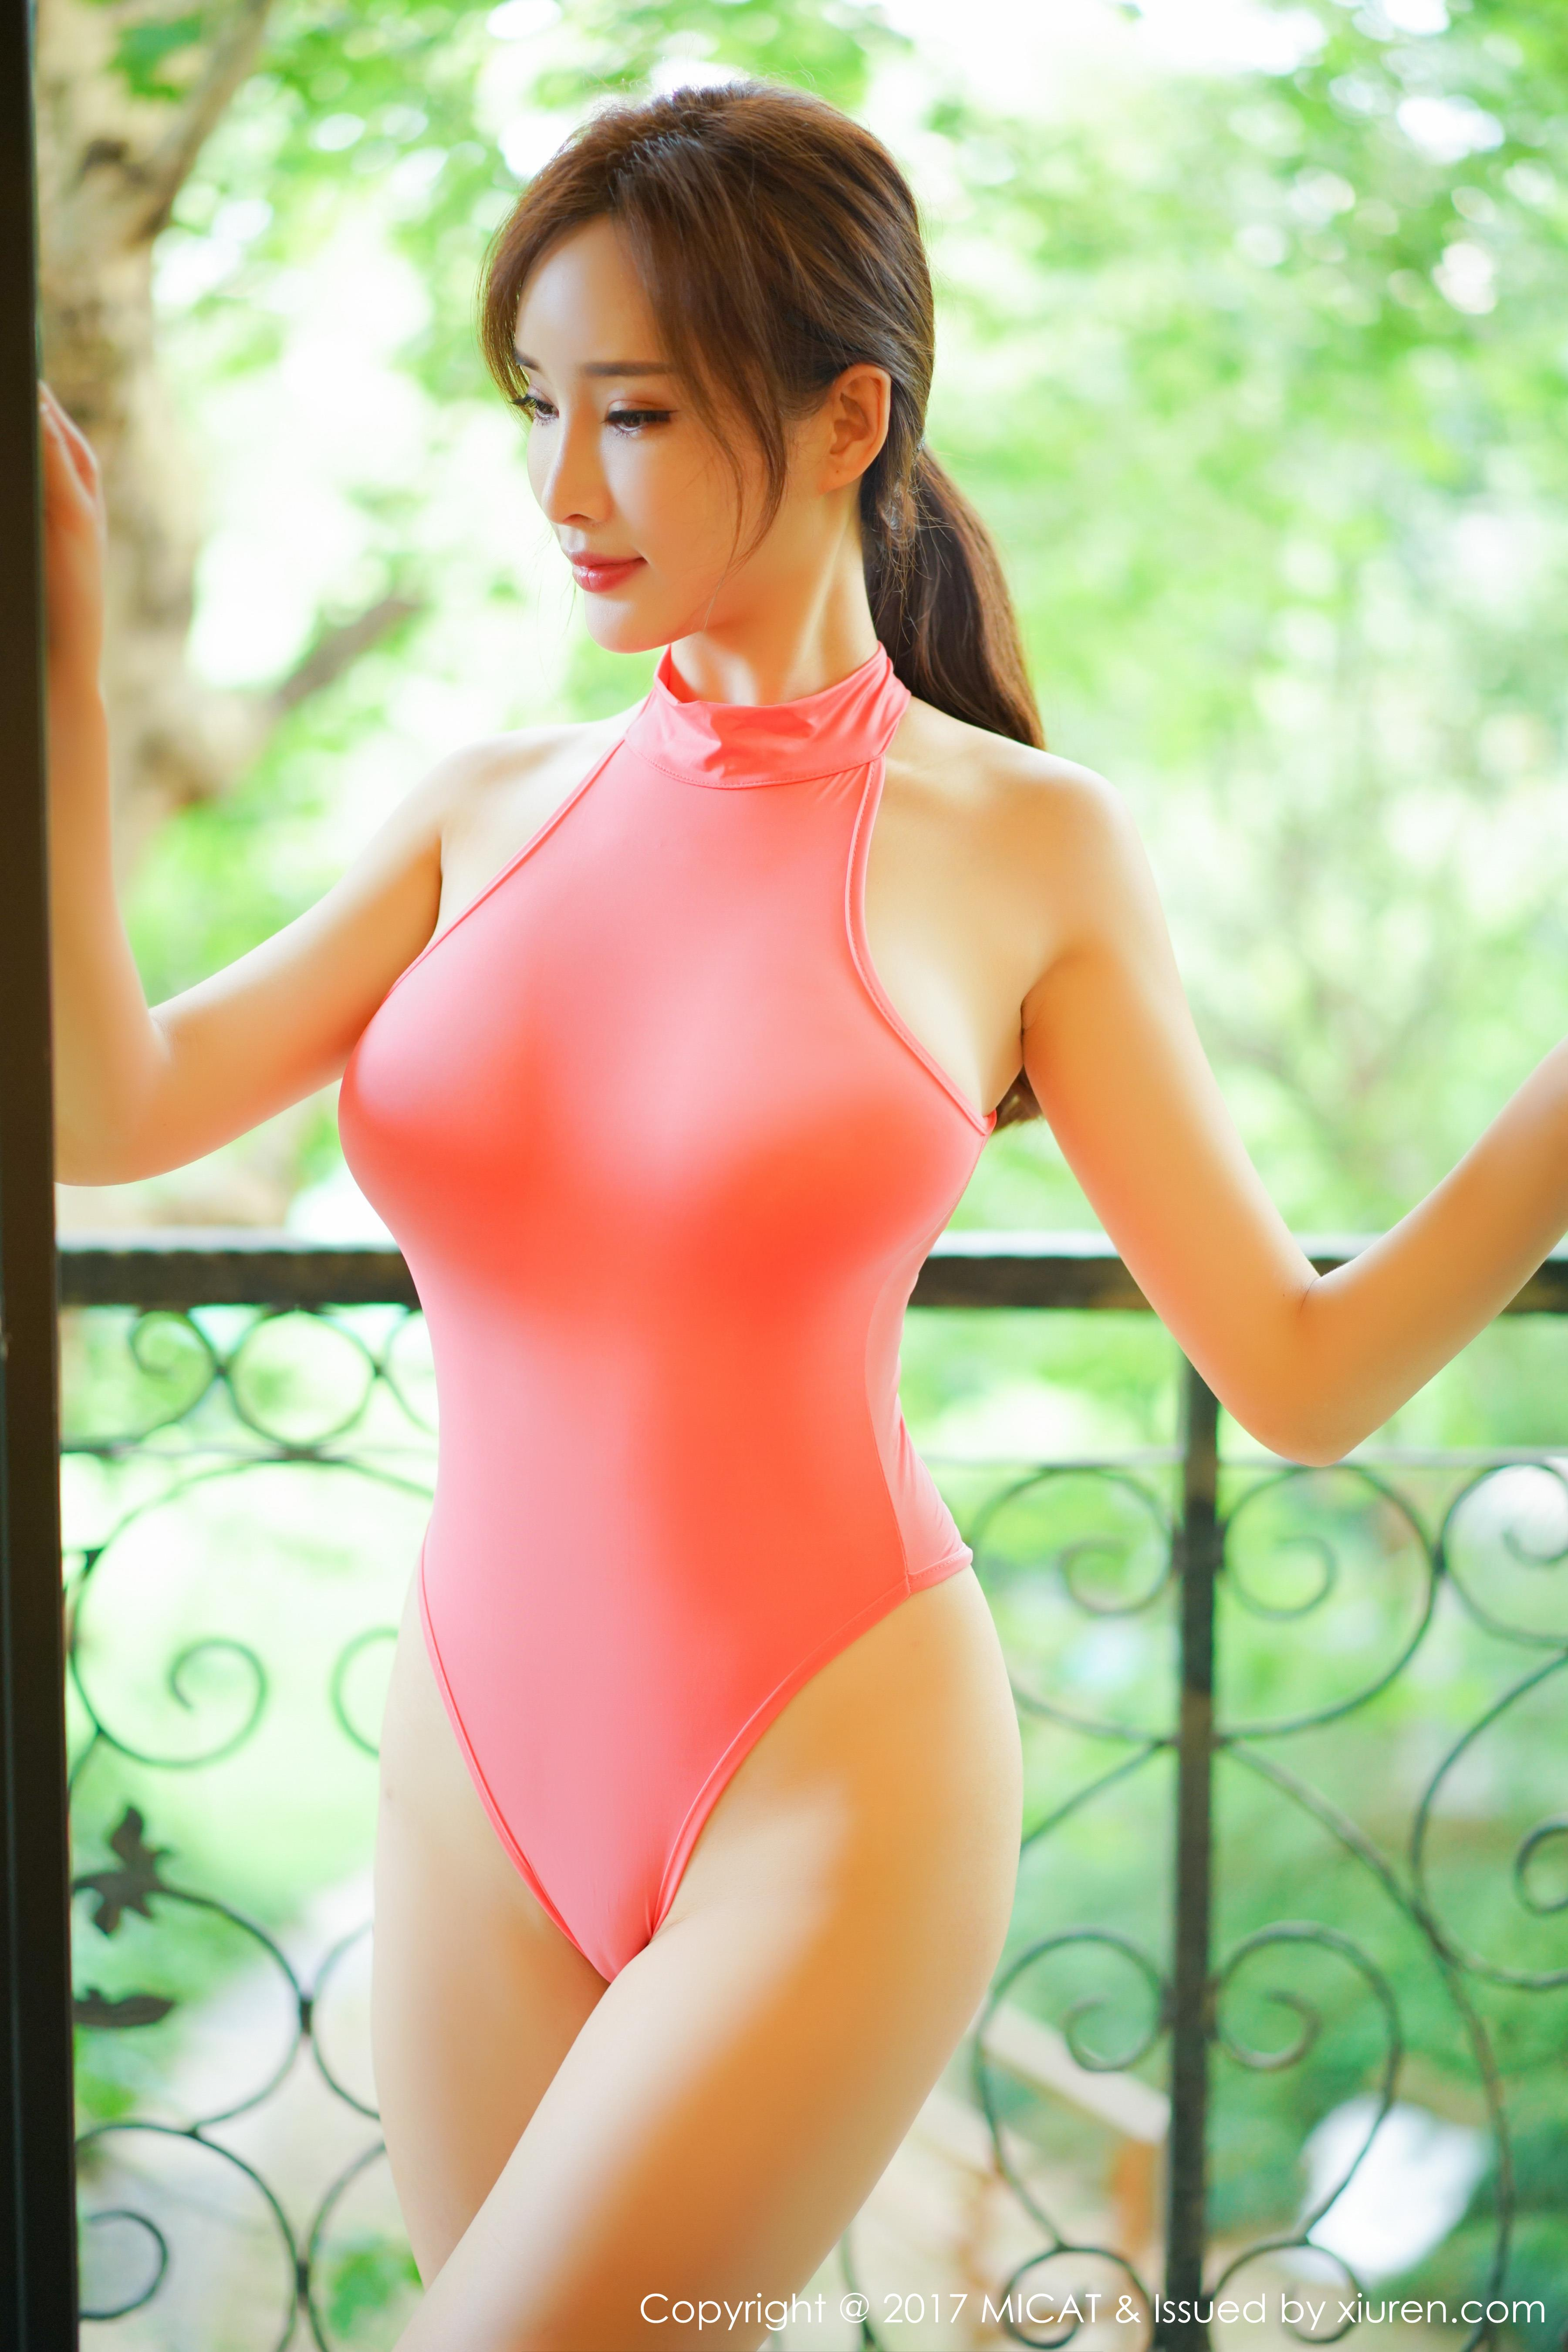 [MICAT猫萌榜]MCT20170807VOL0026 土肥圆矮挫穷 性感比基尼泳装与红色短裙私房写真集